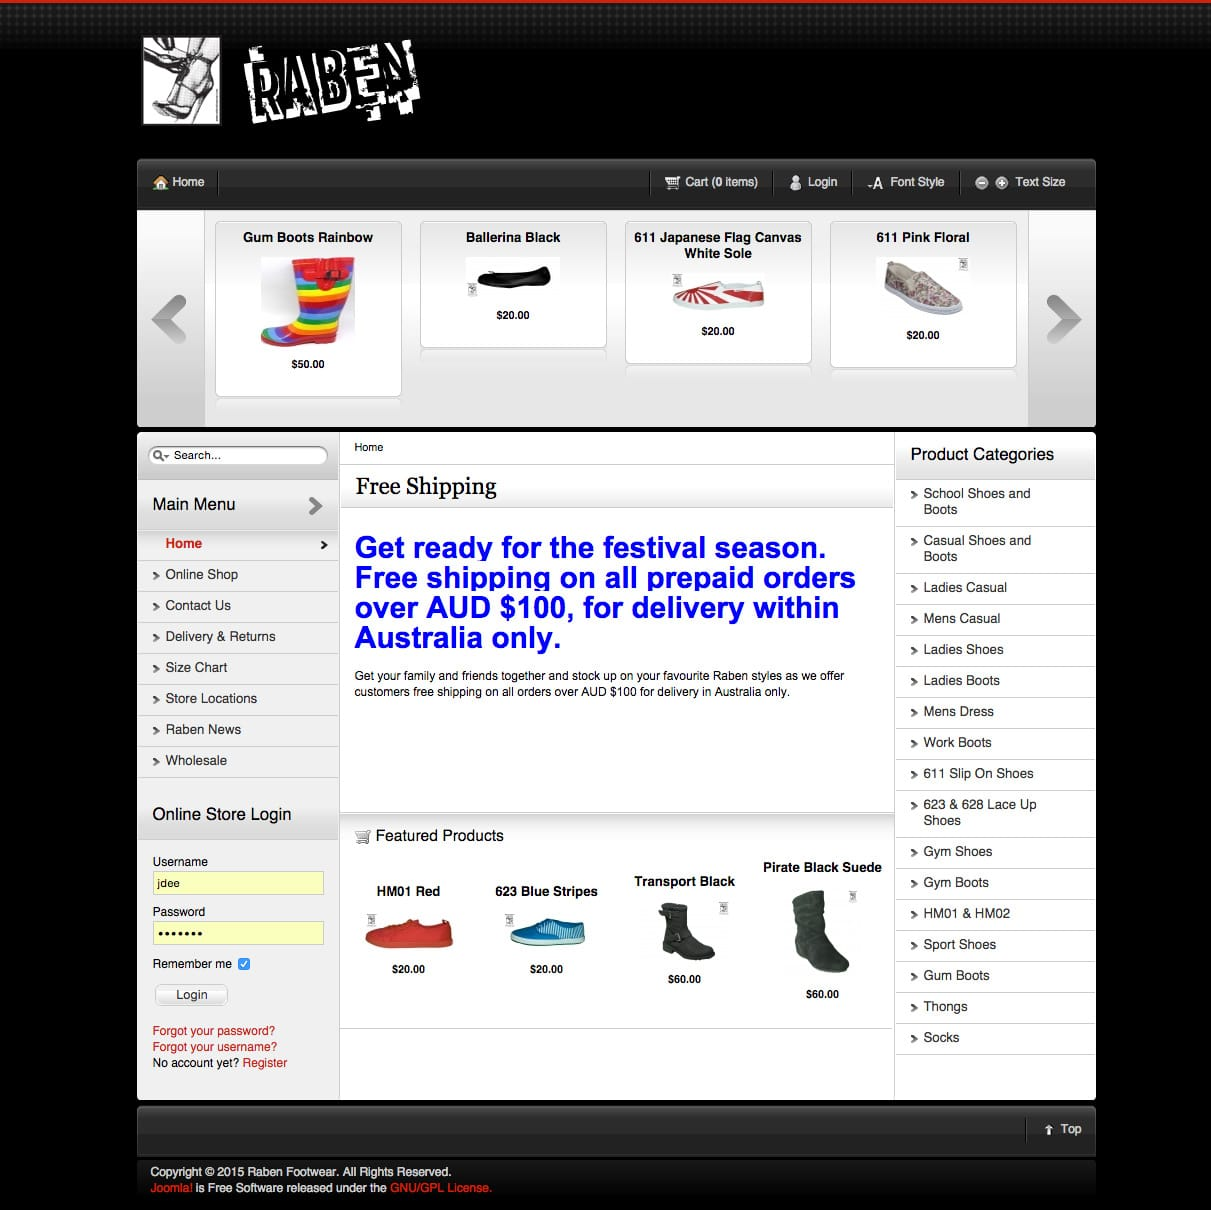 Raben Footwear Home - Oldsite Joomla